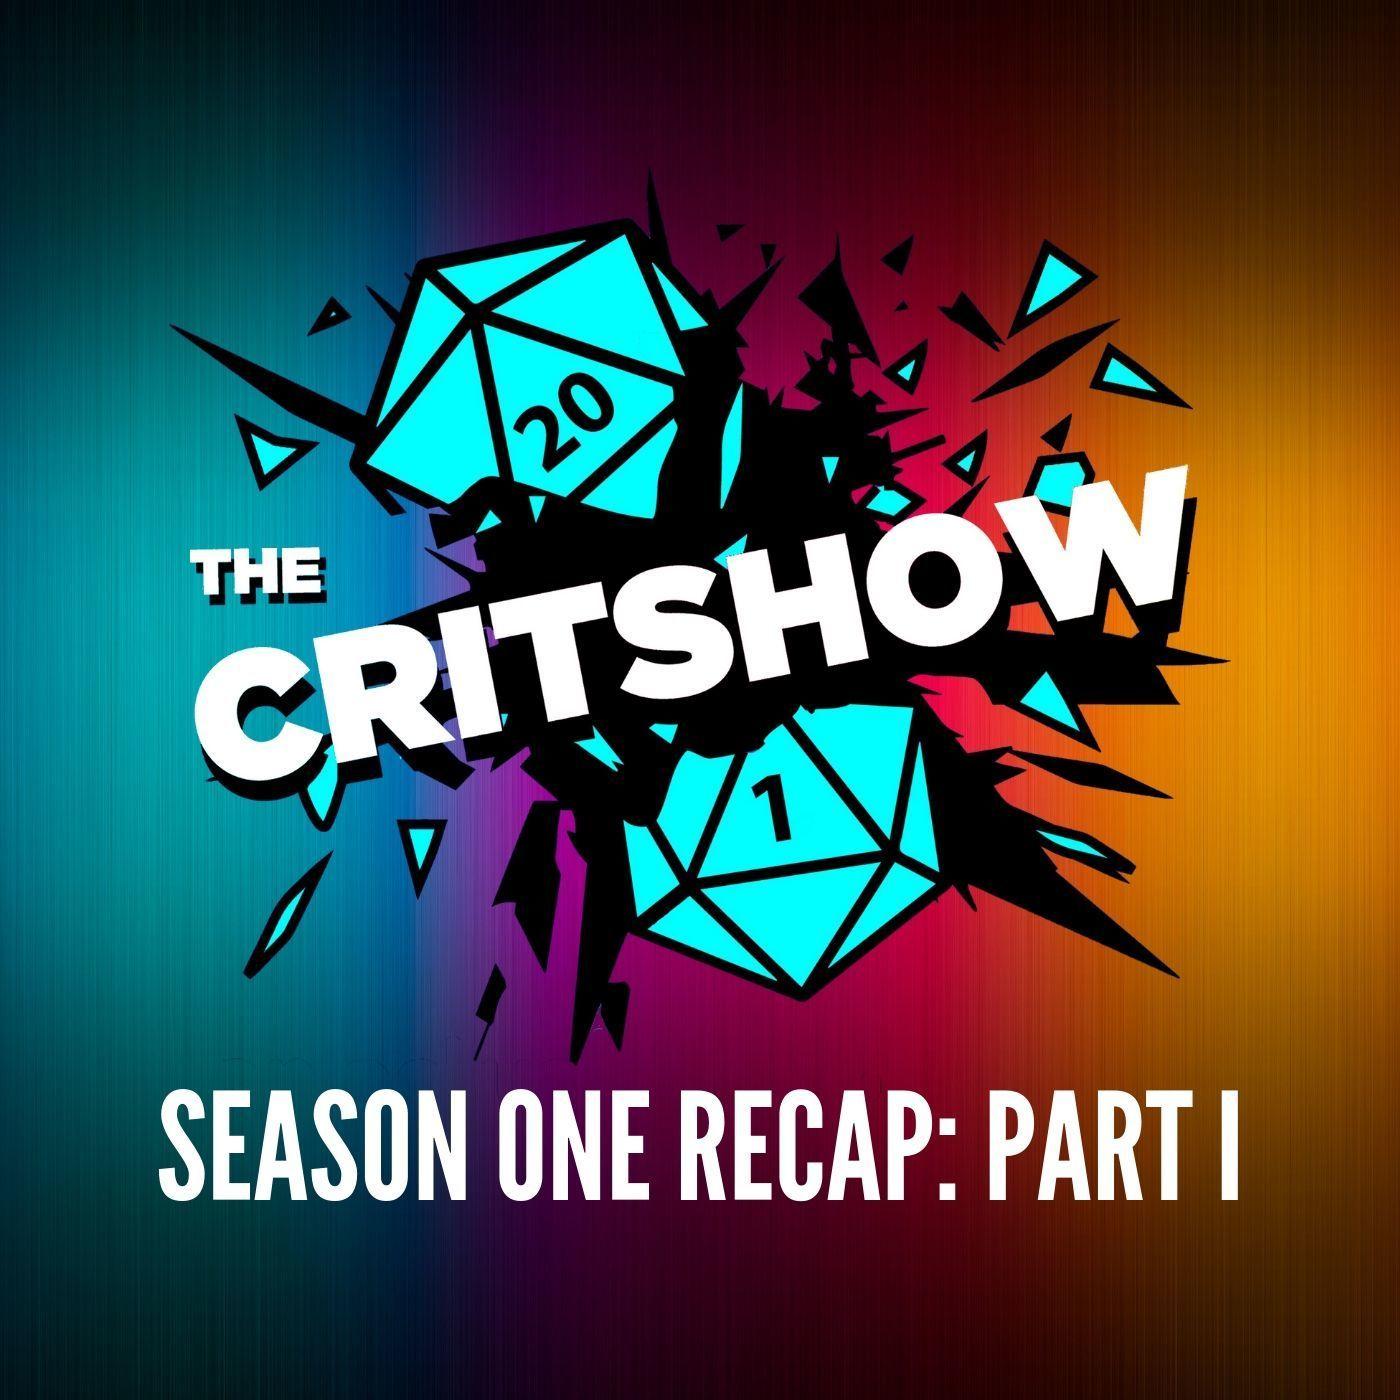 Season 1 Recap, Part 1